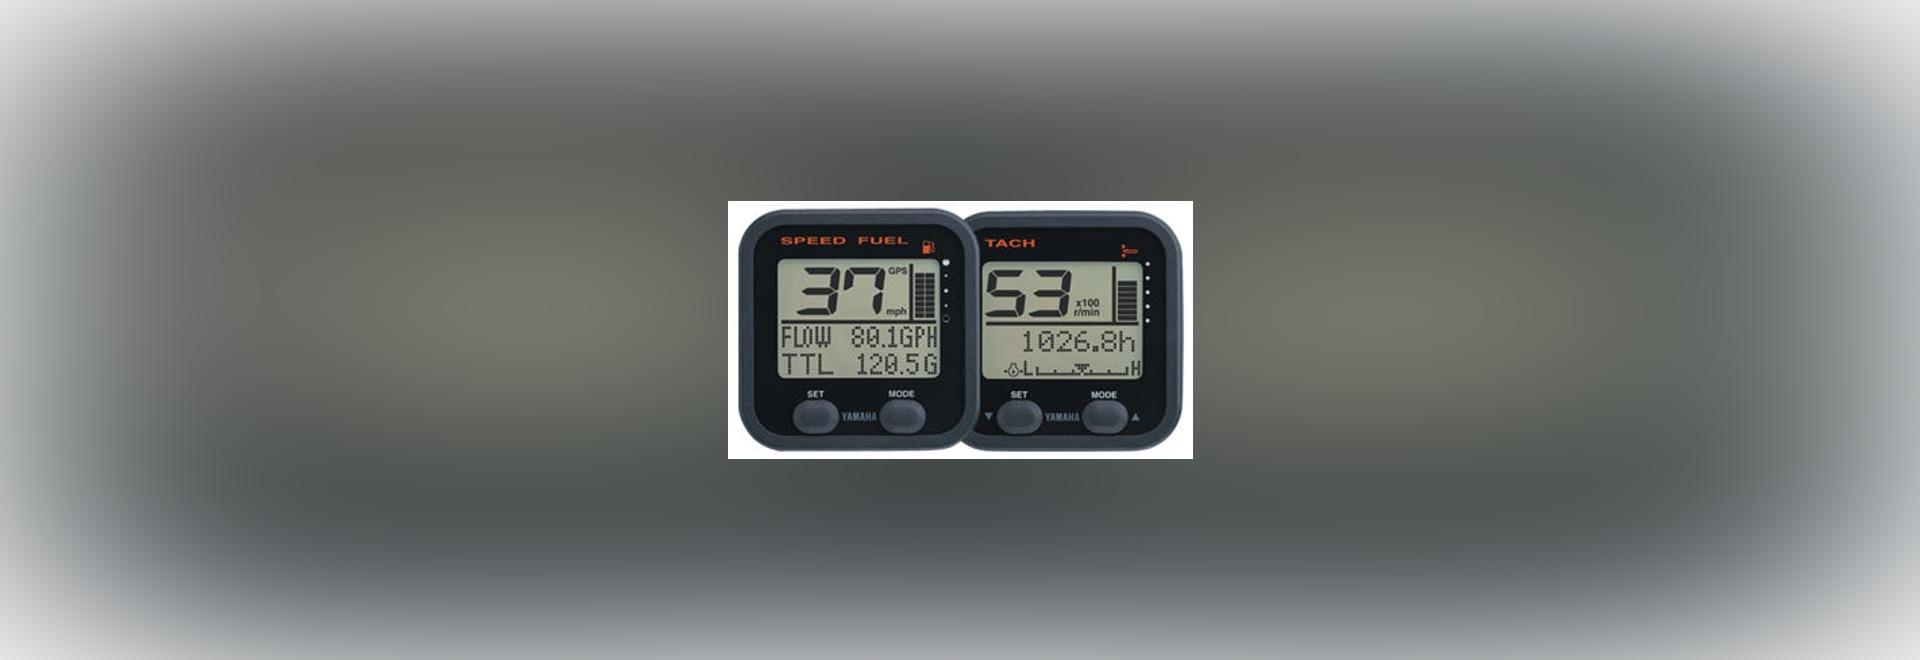 New: digital gauge by Yamah Outboard Motors